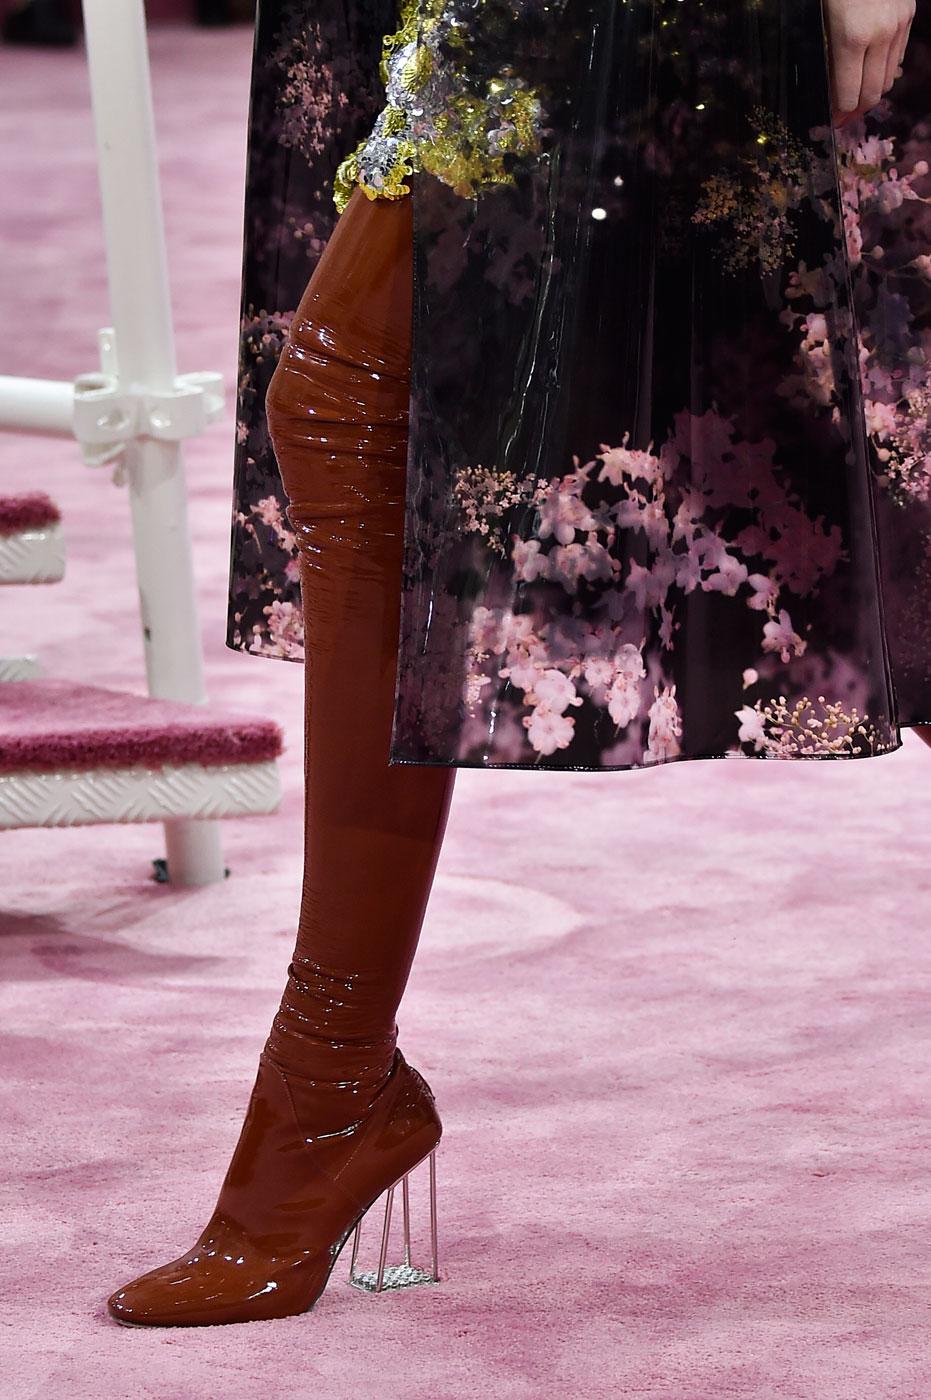 Christian-Dior-fashion-runway-show-close-ups-haute-couture-paris-spring-summer-2015-the-impression-152